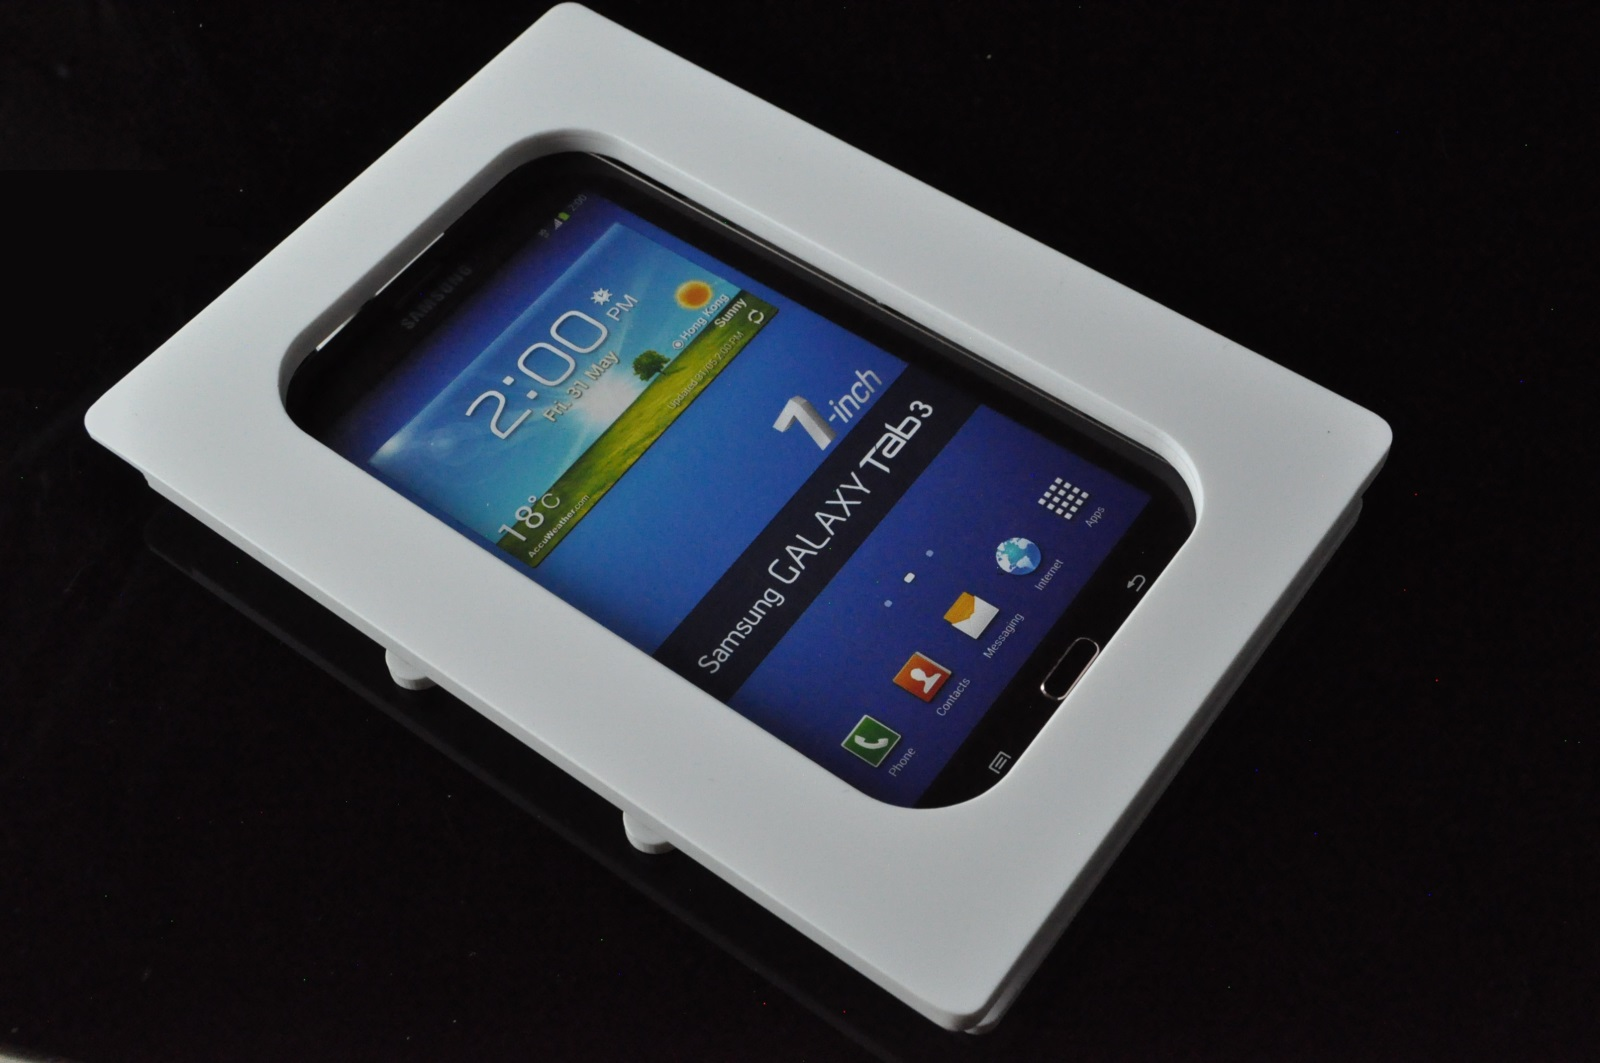 Samsung Galaxy Tab 3 7 0 White Acrylic Security Enclosure